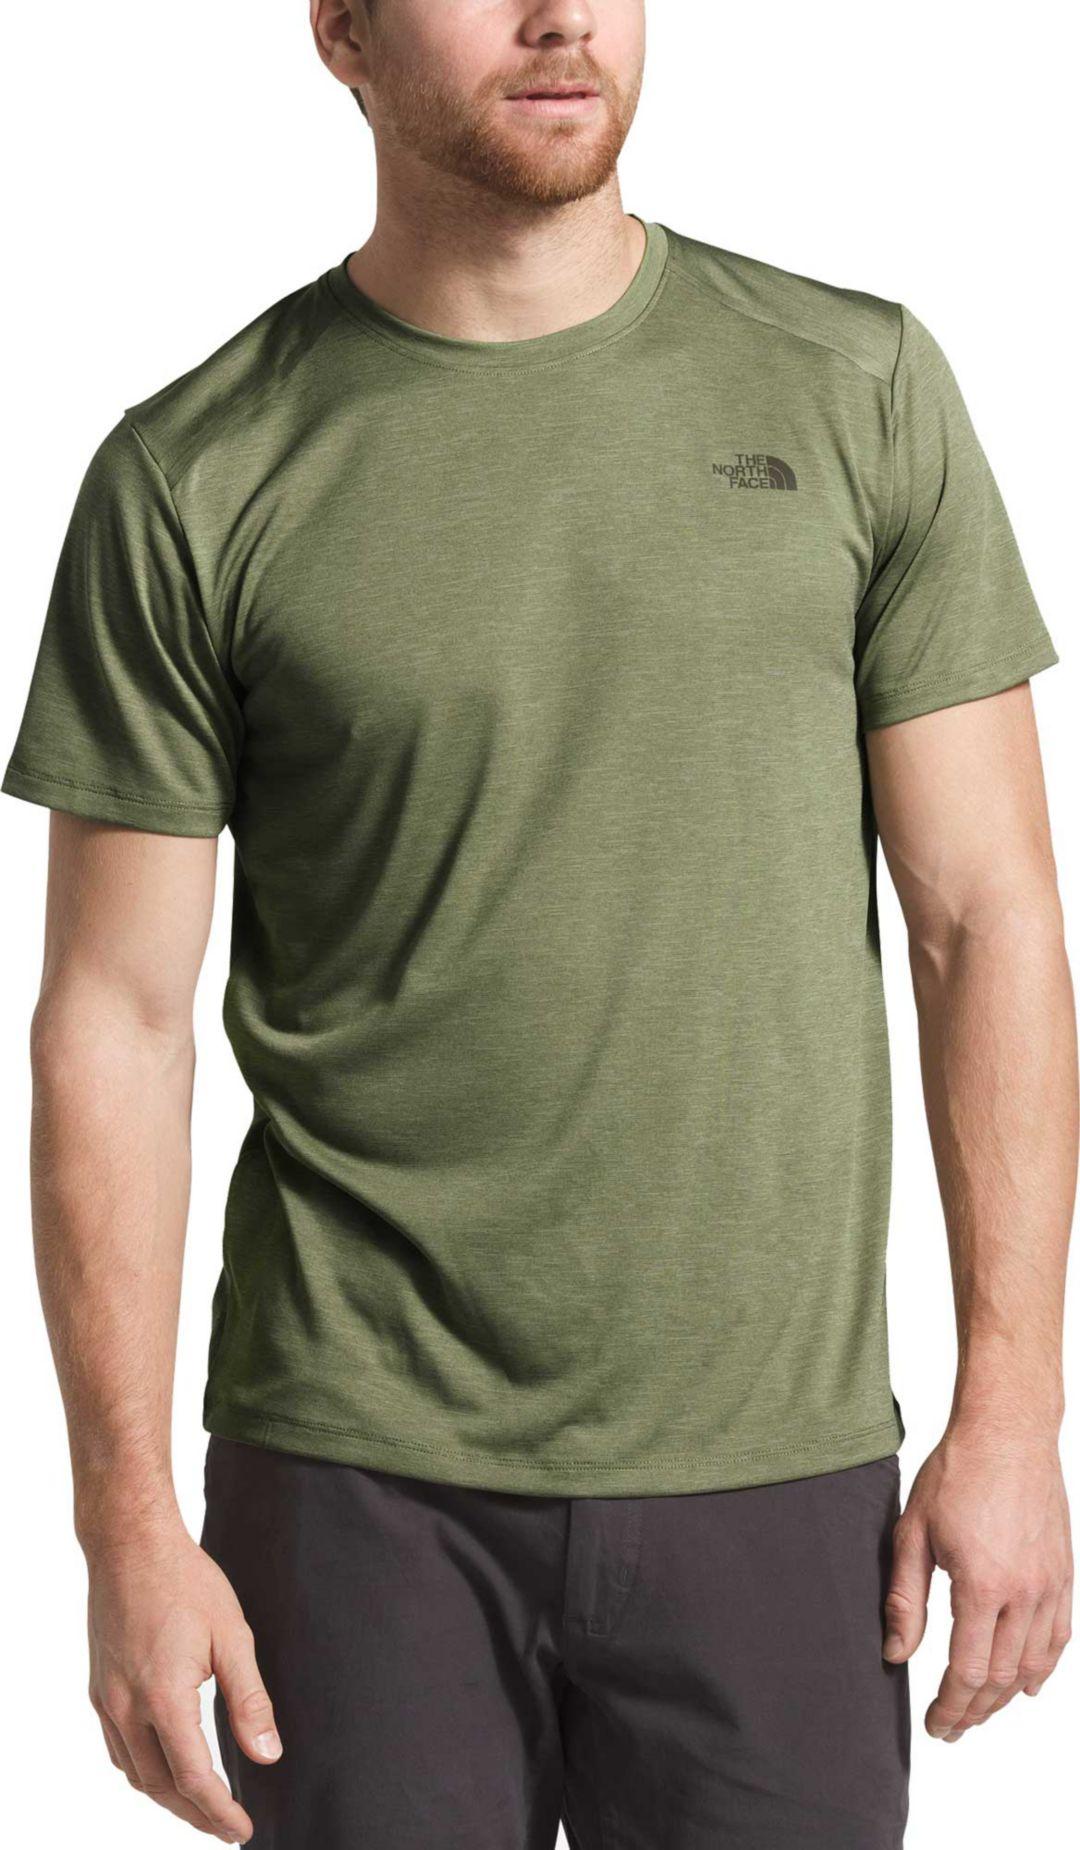 7d4a7a2cf The North Face Men's HyperLayer FlashDry Short Sleeve Crew T-Shirt